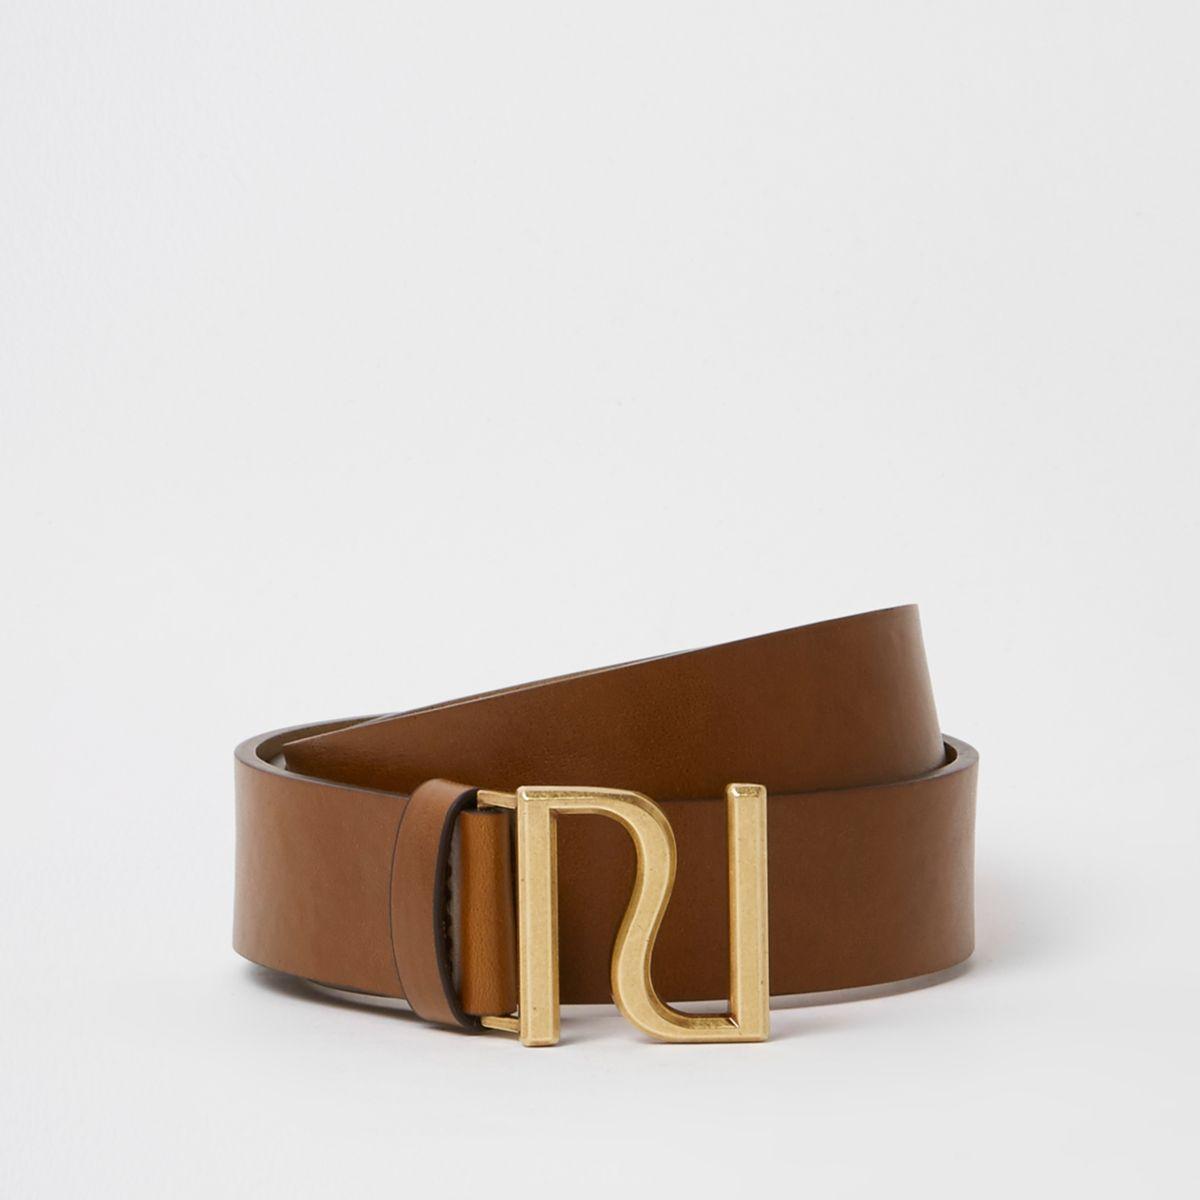 Brown gold tone Ri buckle belt